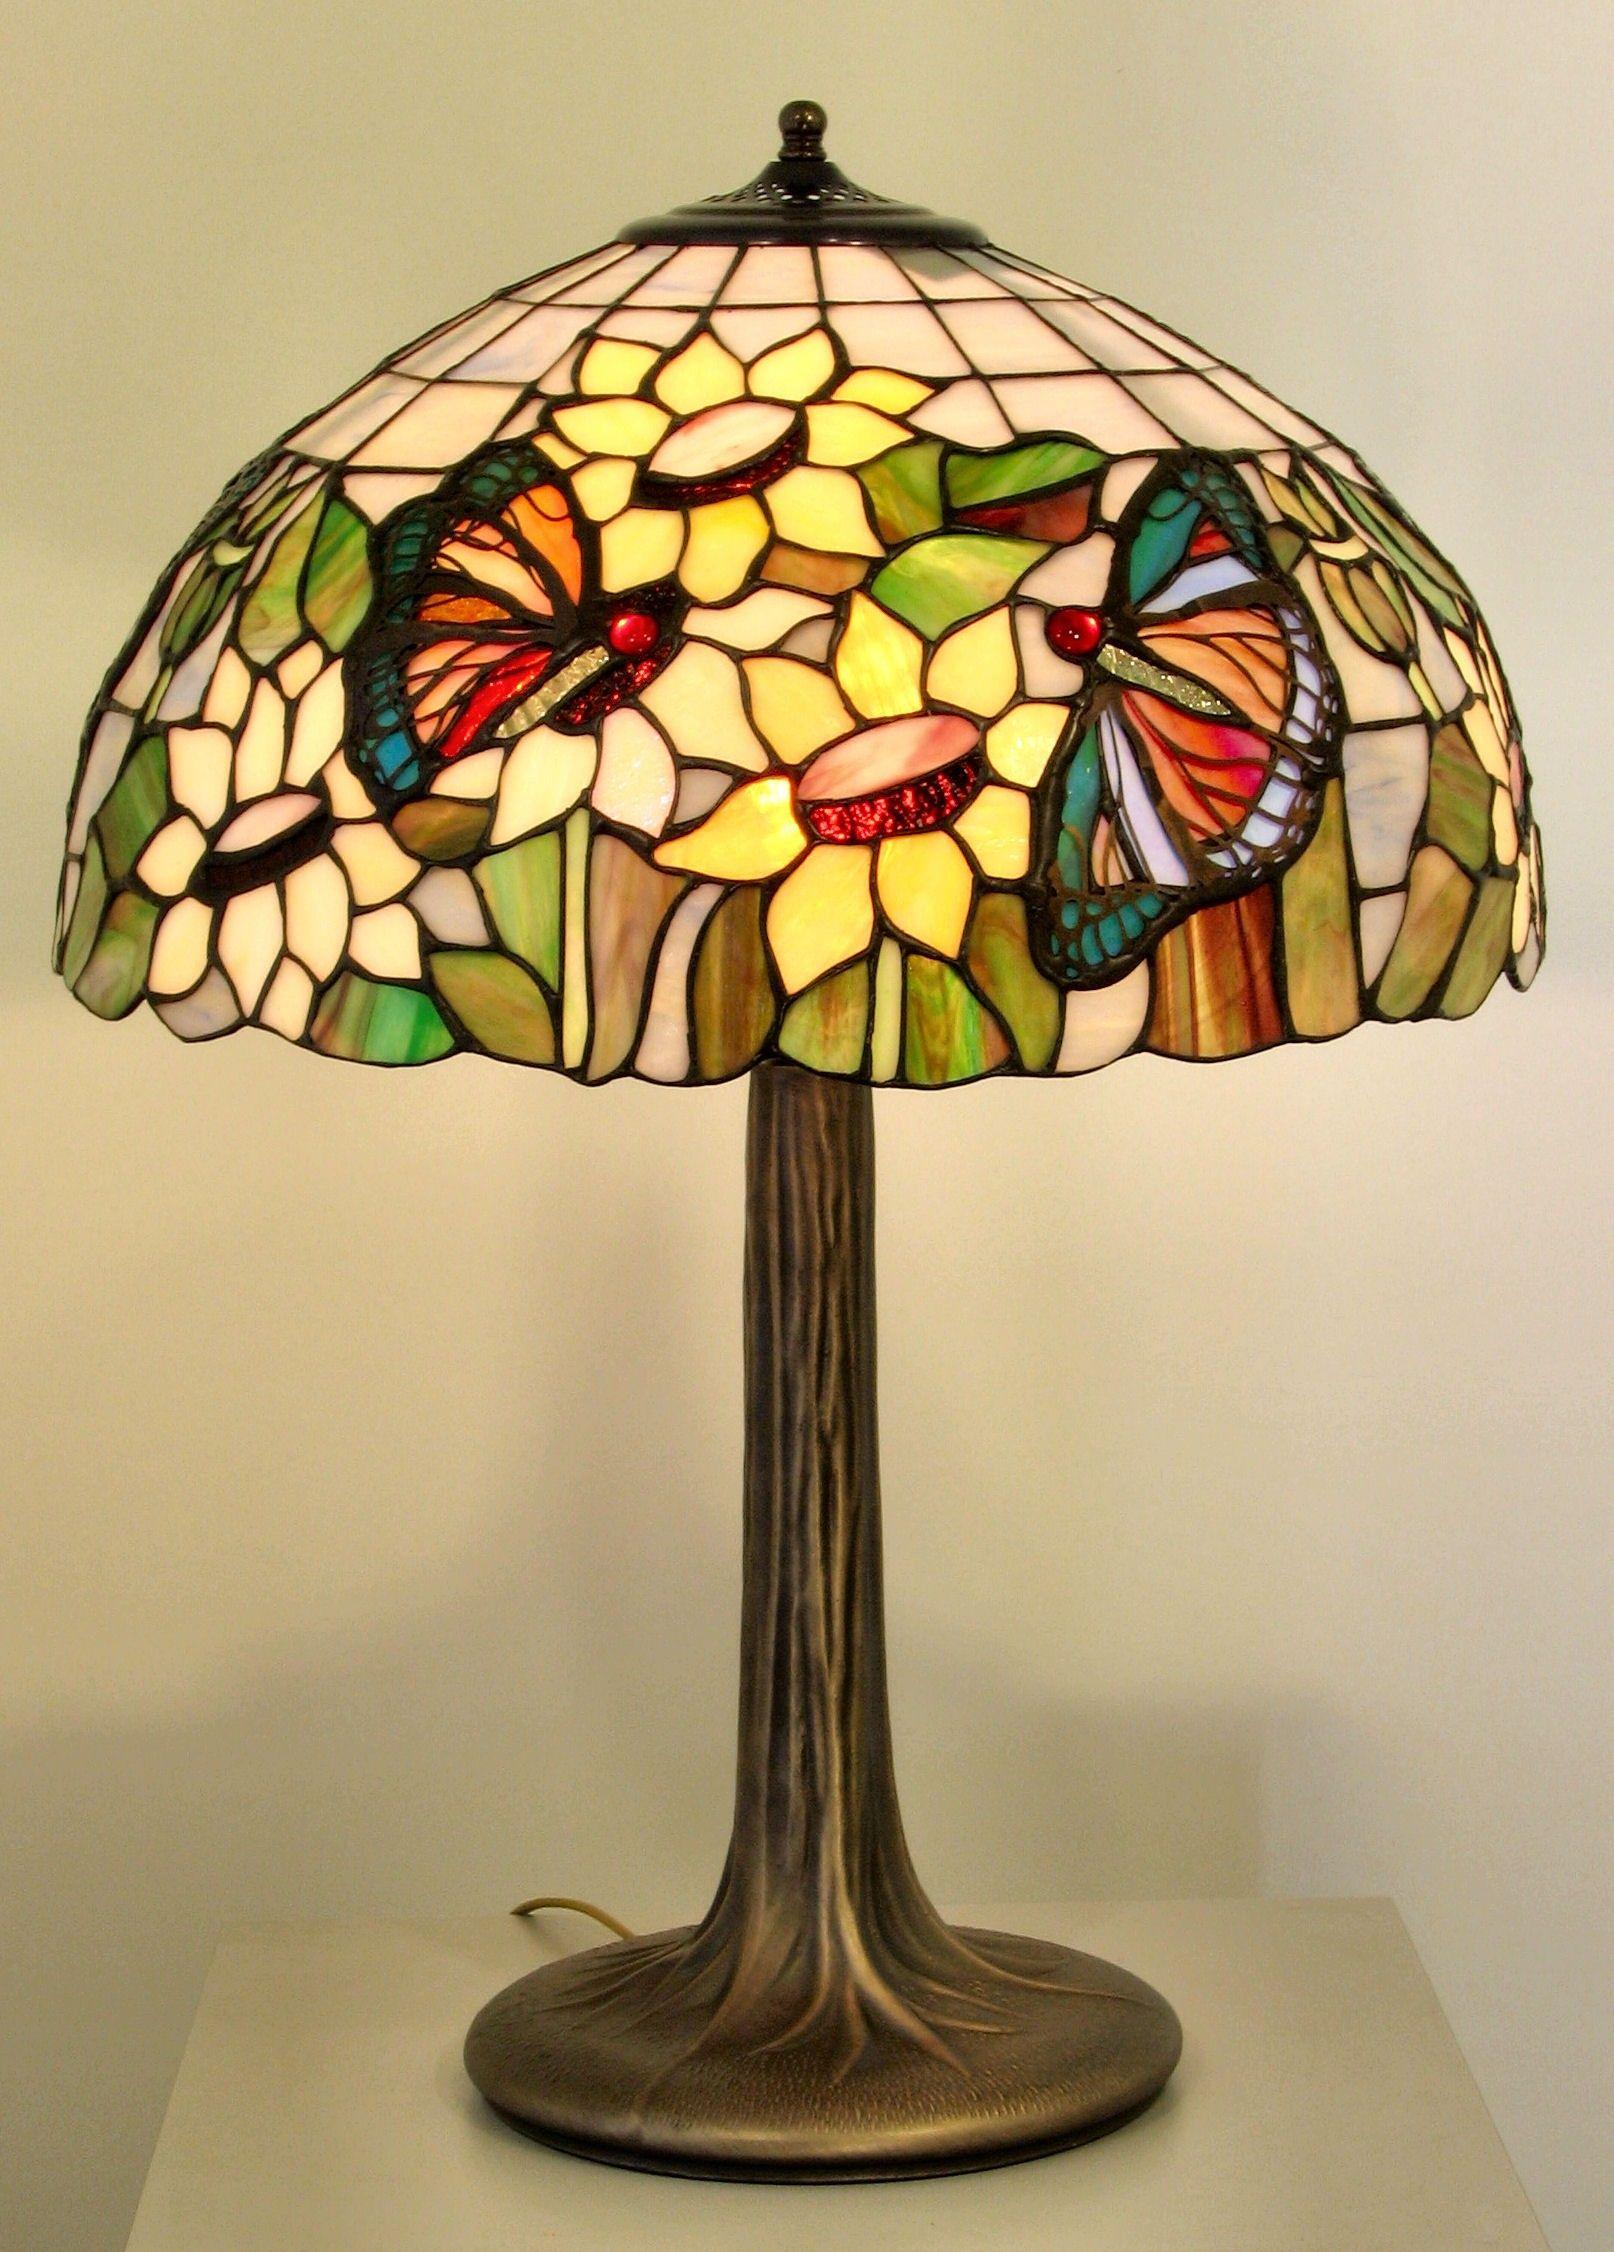 Tiffany Lamp Lamp Tiffany Lamps